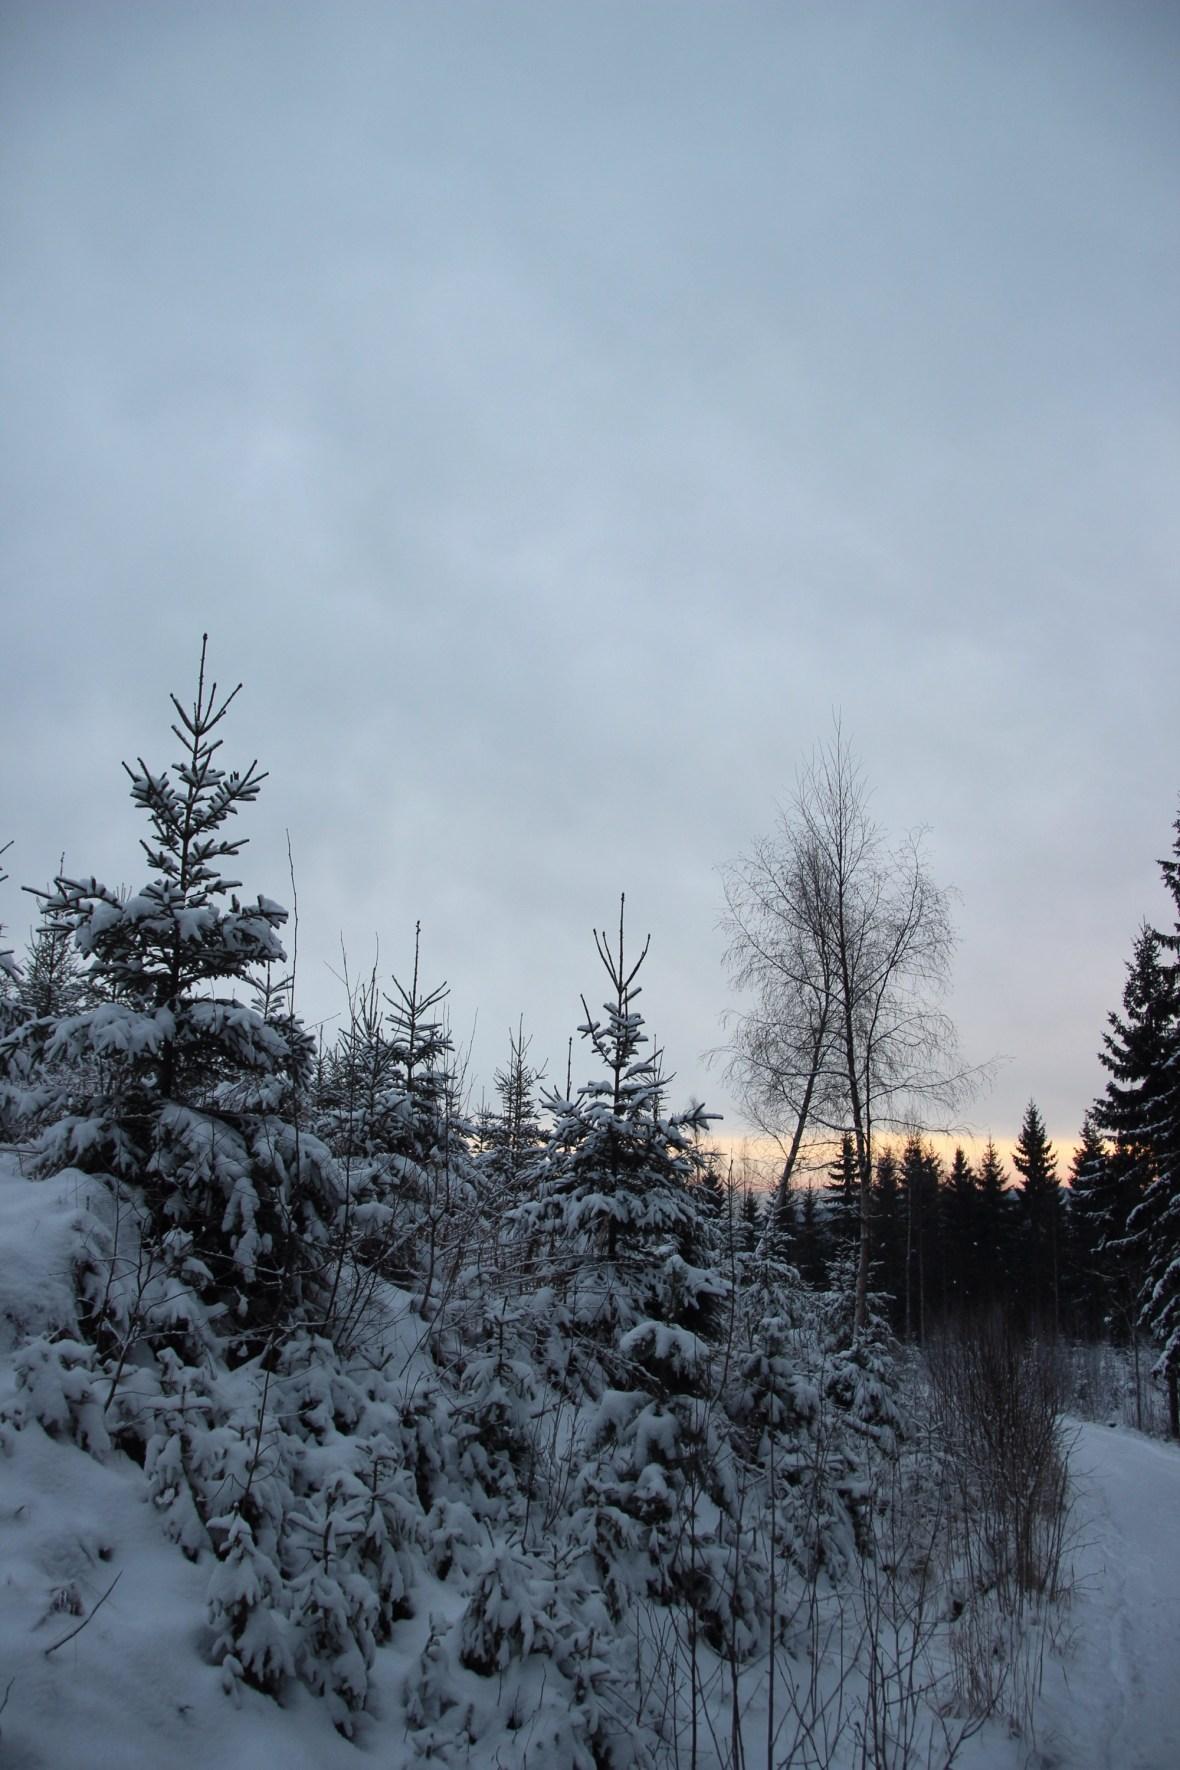 2014/12/img_1744-1.jpg